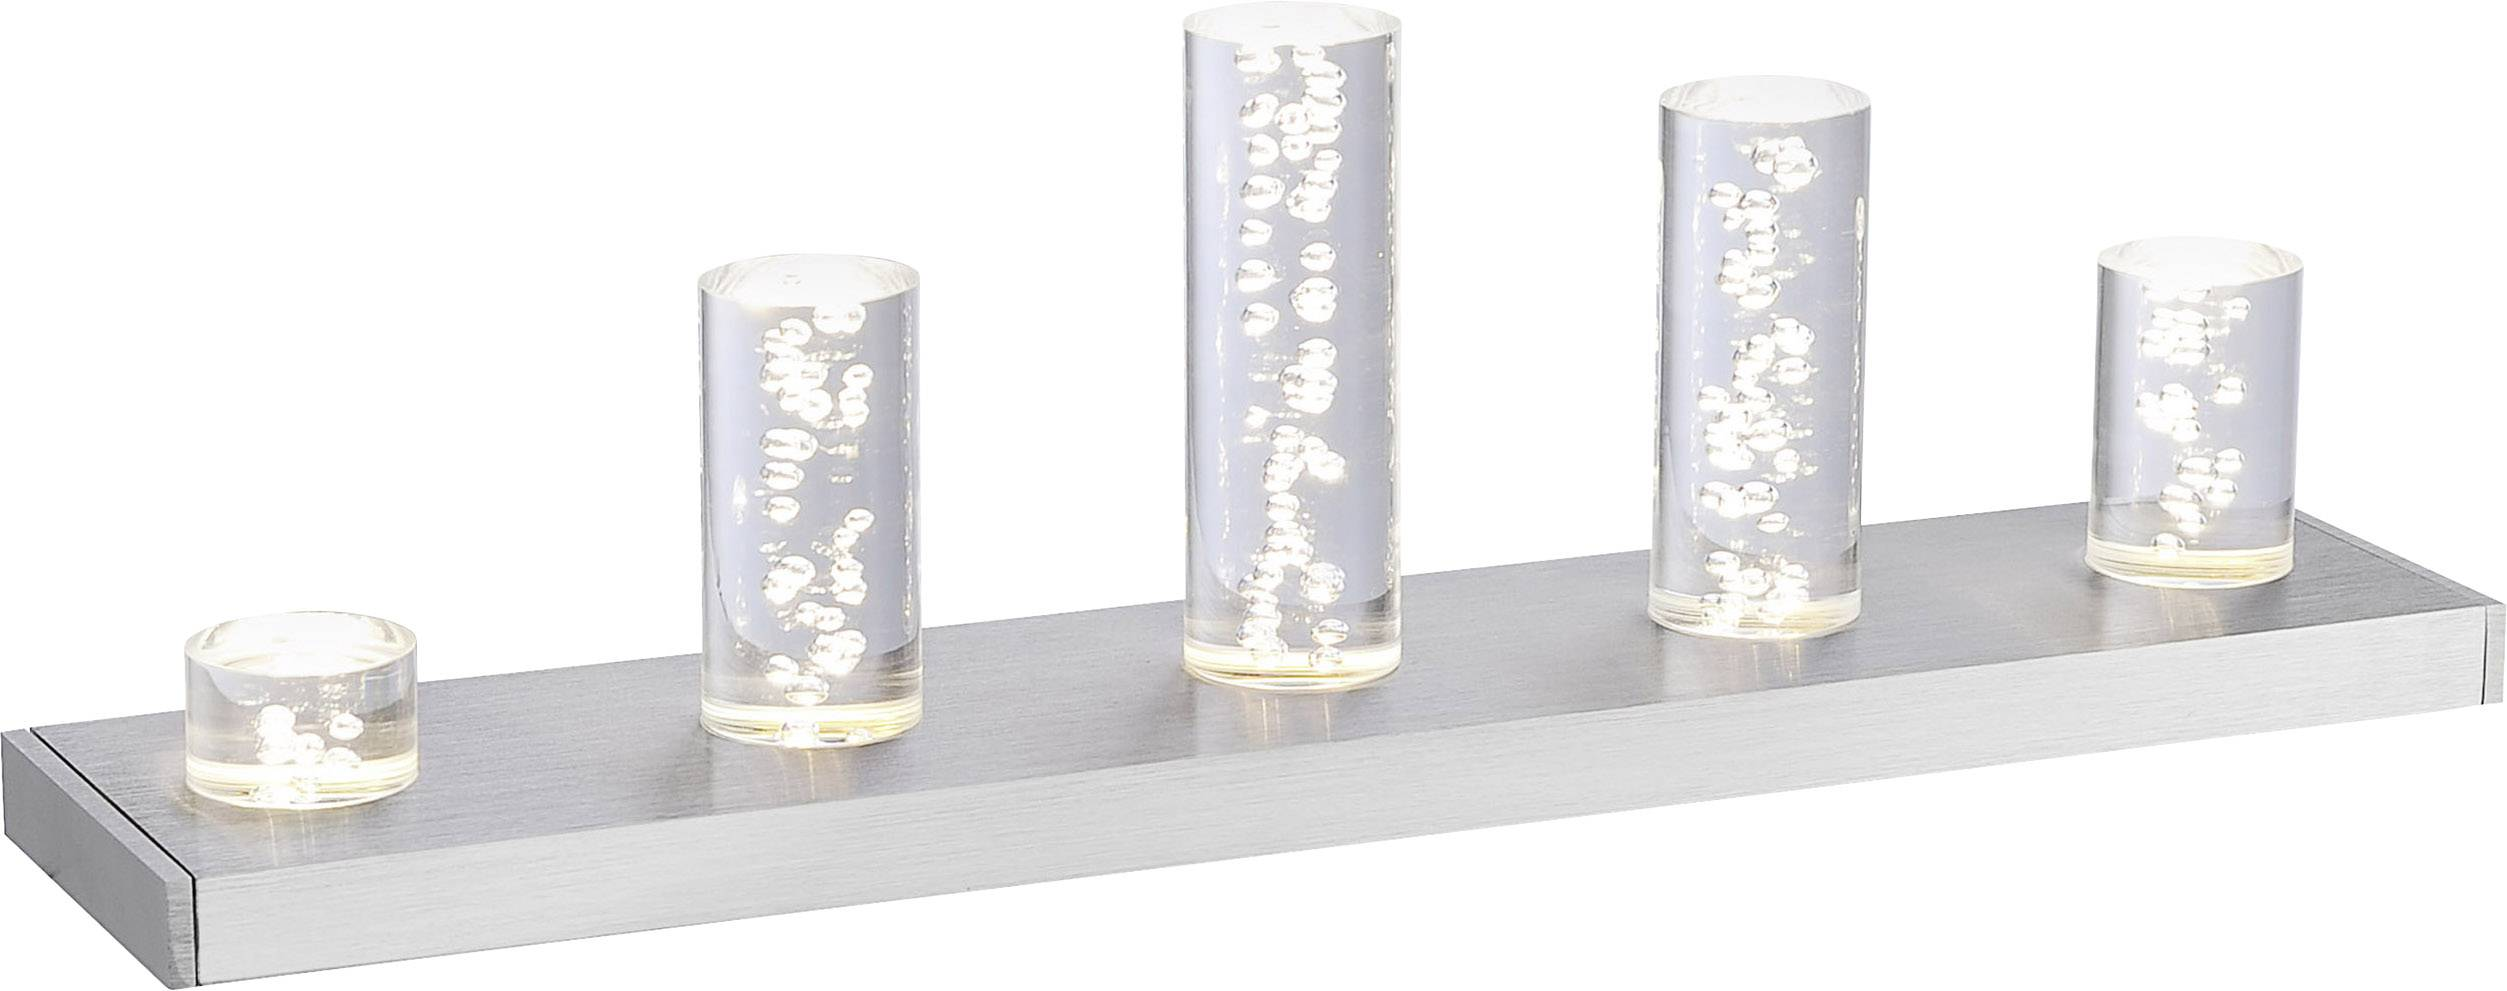 Dekoračná LED lampa na stôl Paul Neuhaus Q®;Q®-Skyline, 2.5 W, RGBW